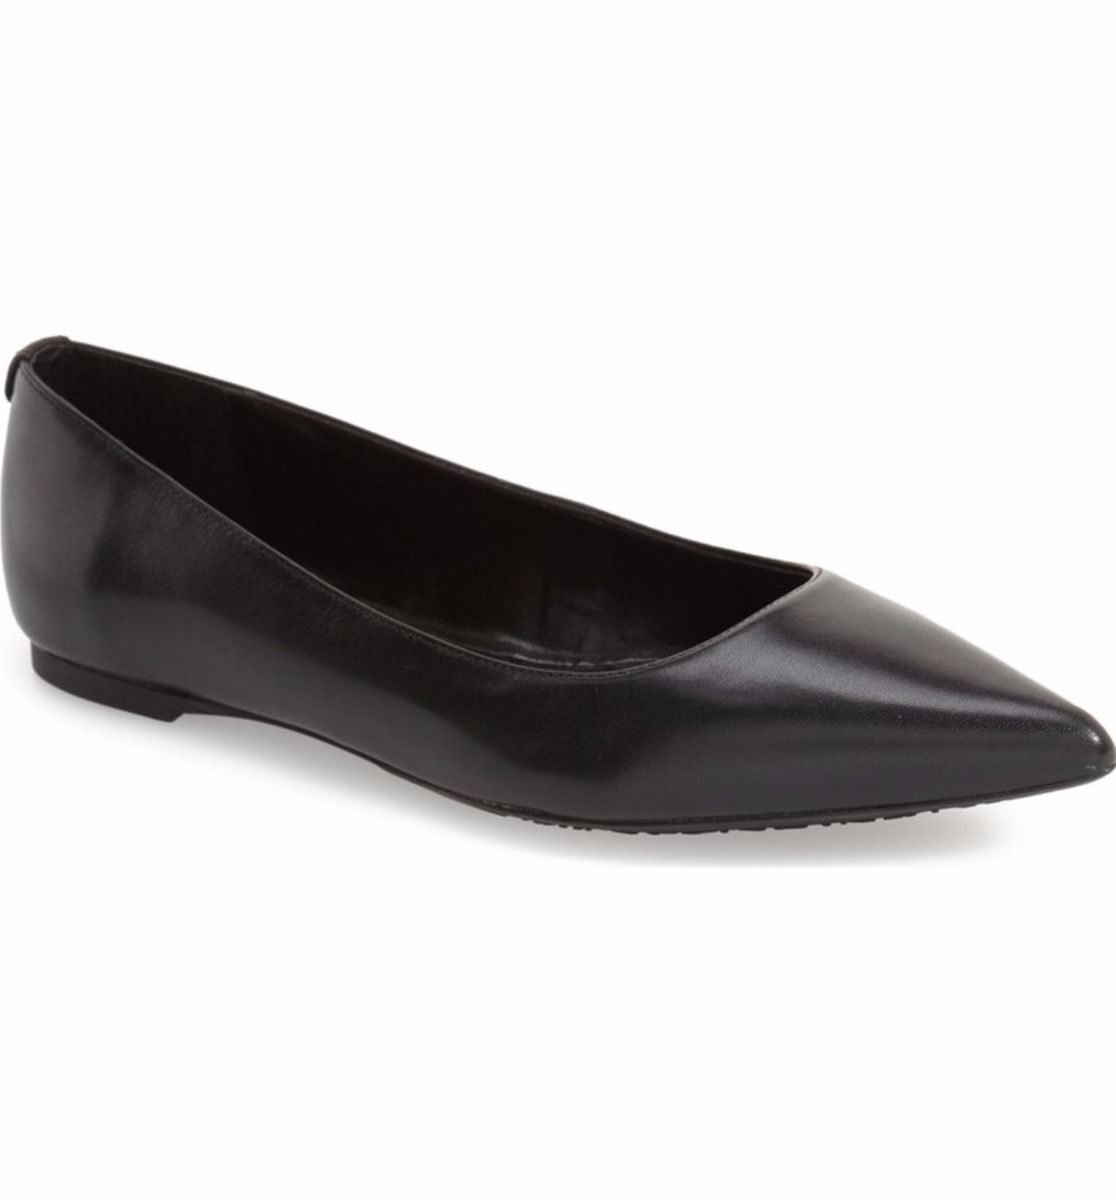 MICHAEL Michael Kors Arianna Black Leather Pointed Toe Flats Shoes 7.5 NEW NIB https://t.co/48vcwzZCku https://t.co/SjHn03PRCX